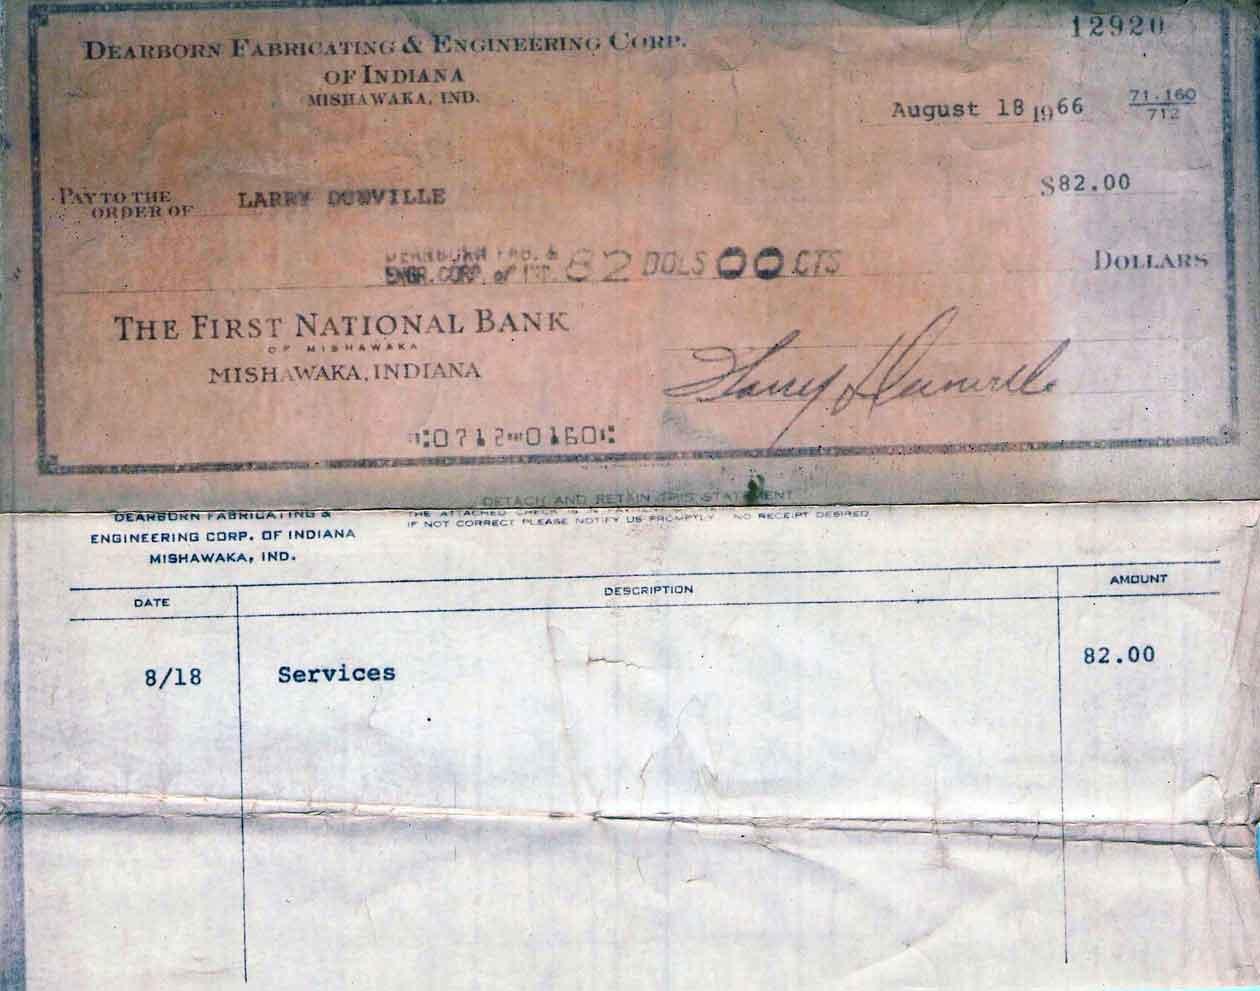 Larry Dunville, 1st Dearborn Crane paycheck, August 18, 1966, $82.00